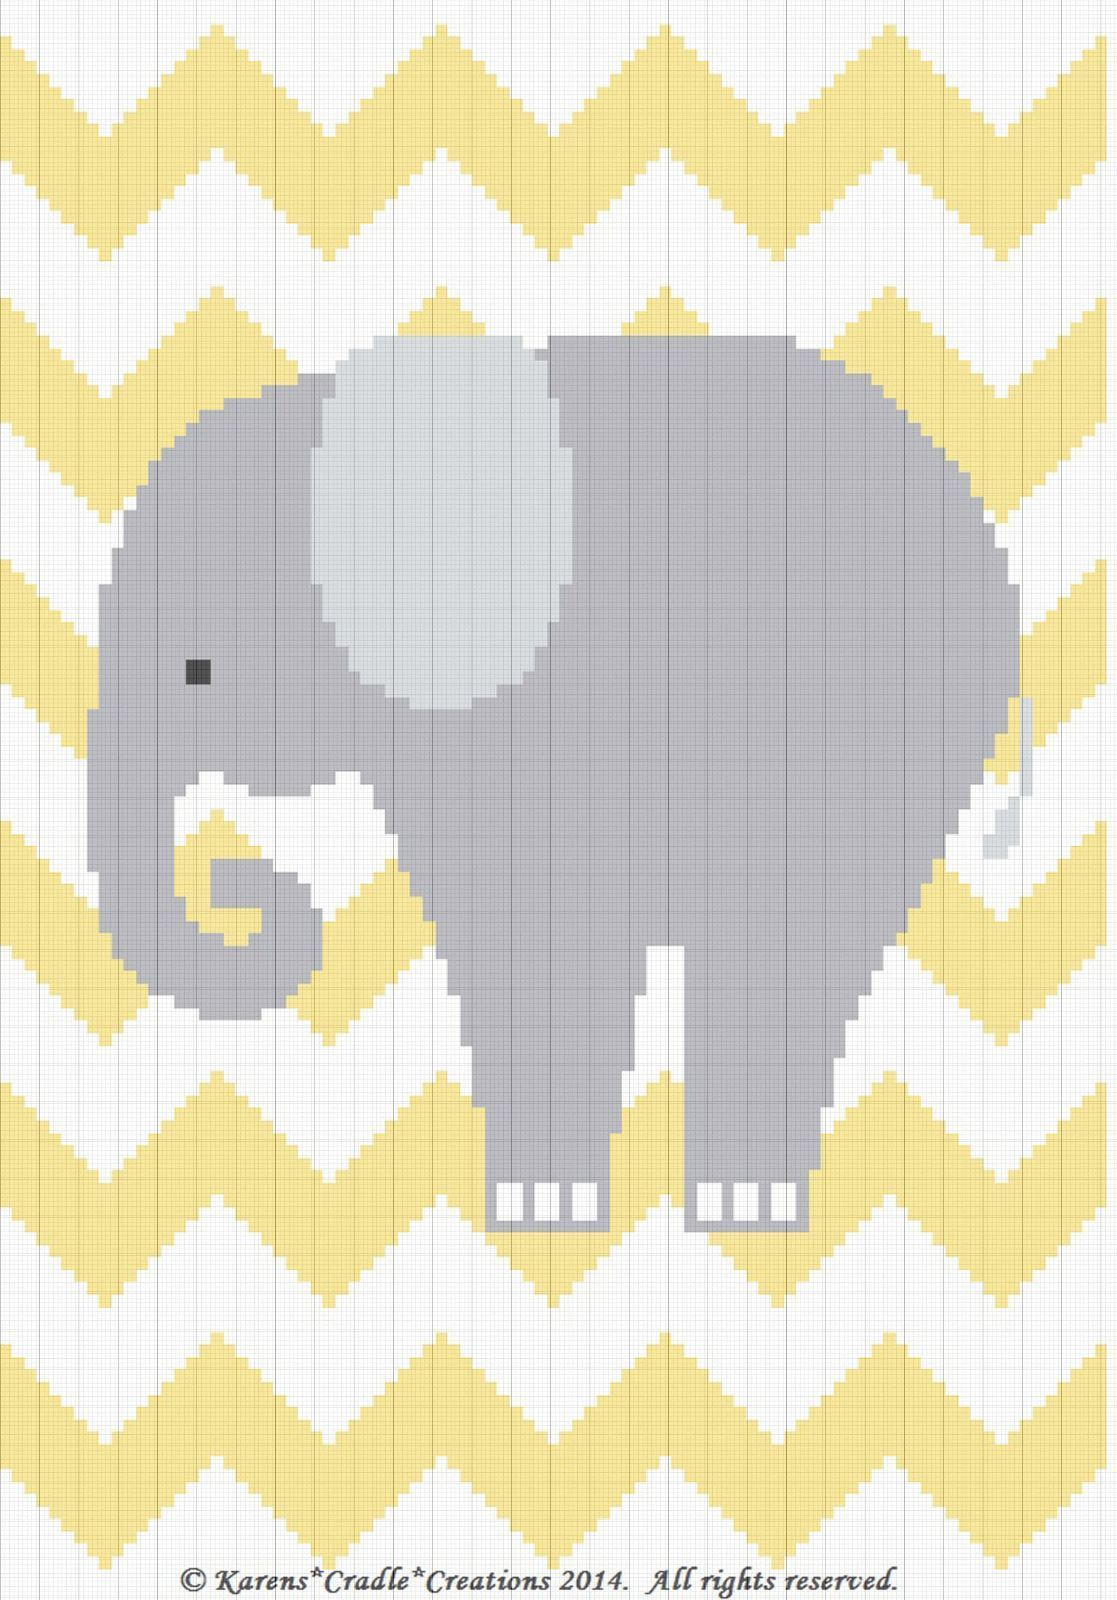 Crochet Patterns - ELEPHANT CHEVRON Baby Graph/Chart Afghan Pattern ...